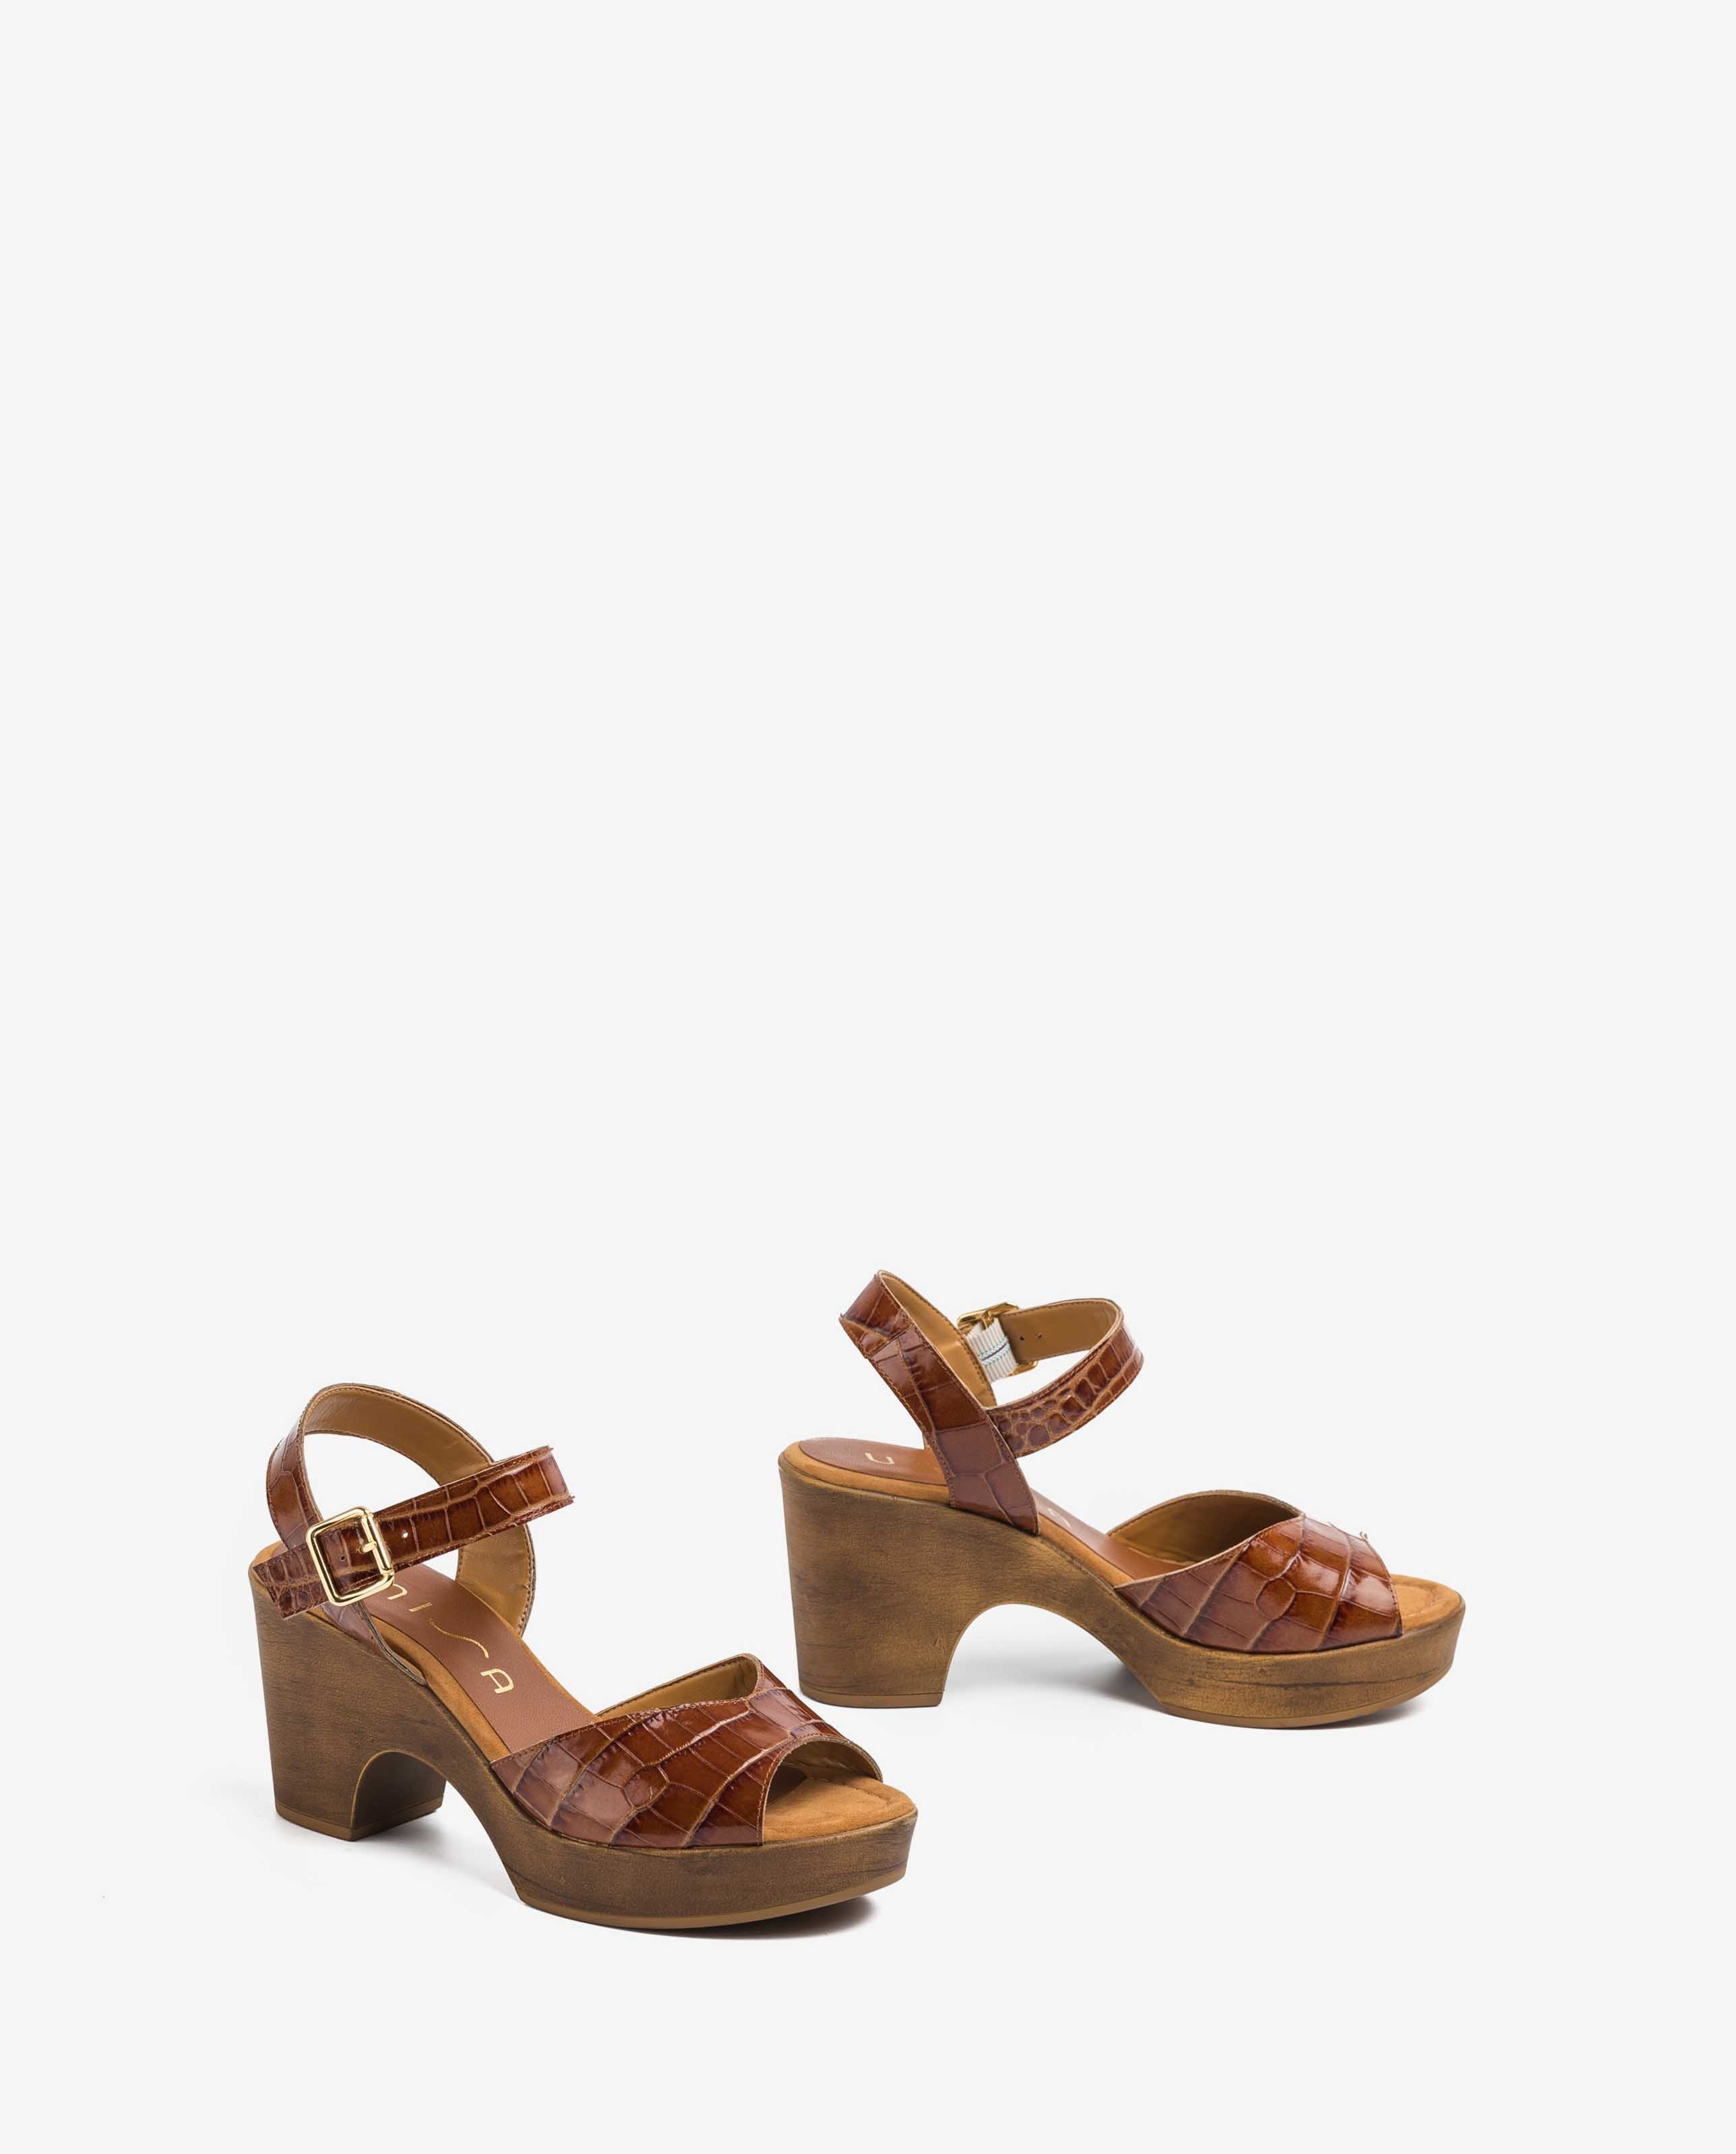 UNISA Sandale marron crocodile OTTIS_CRW saddle 3